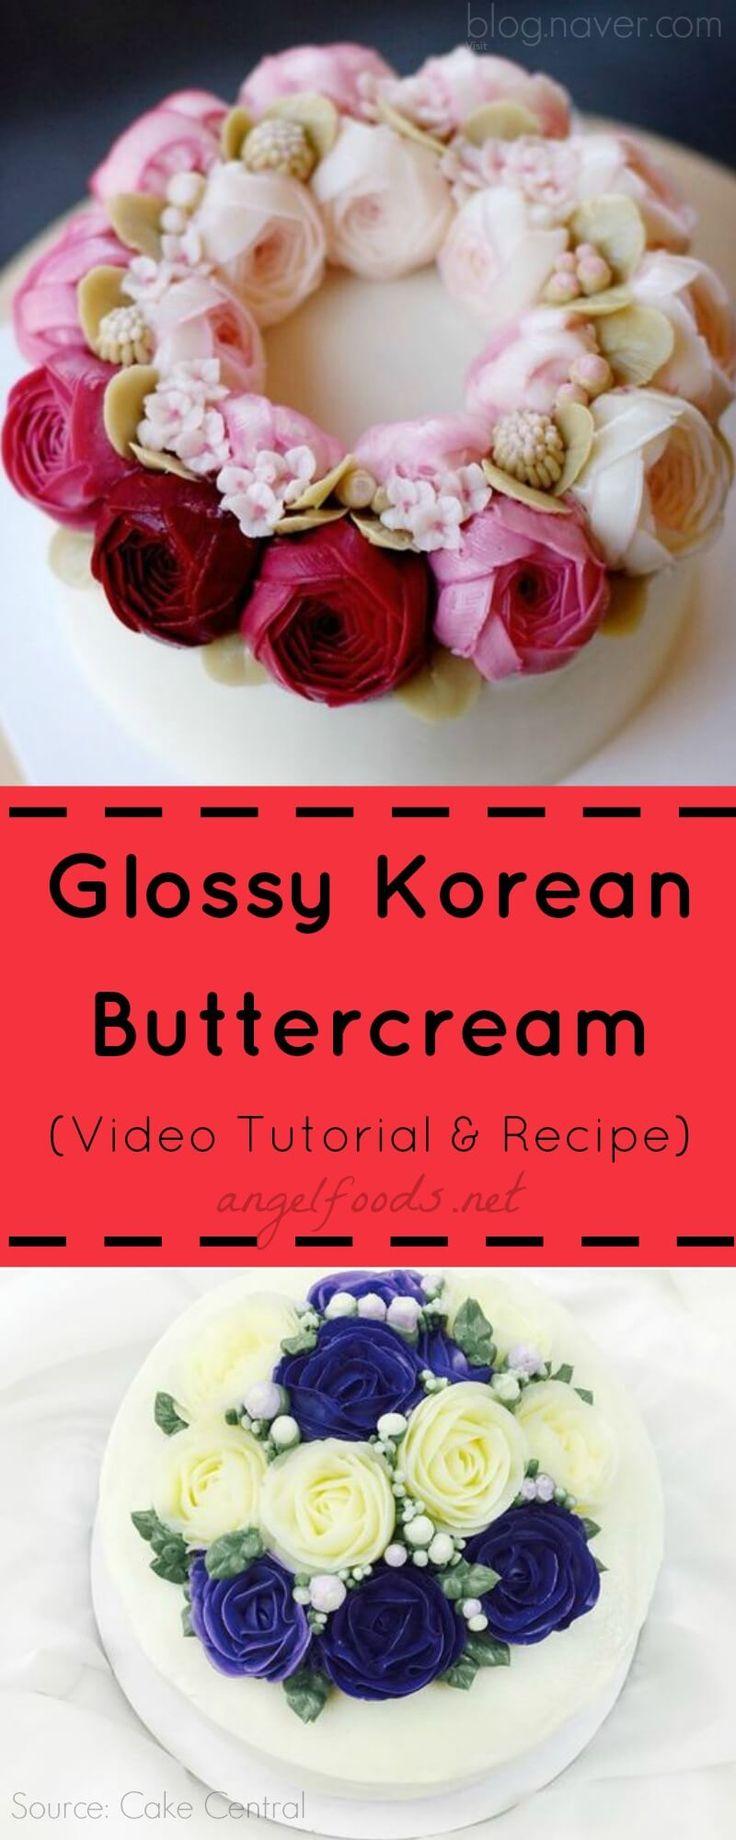 Brillante Coreano Buttercream (Video Tutorial & Recipe)    Alimentos de ángel